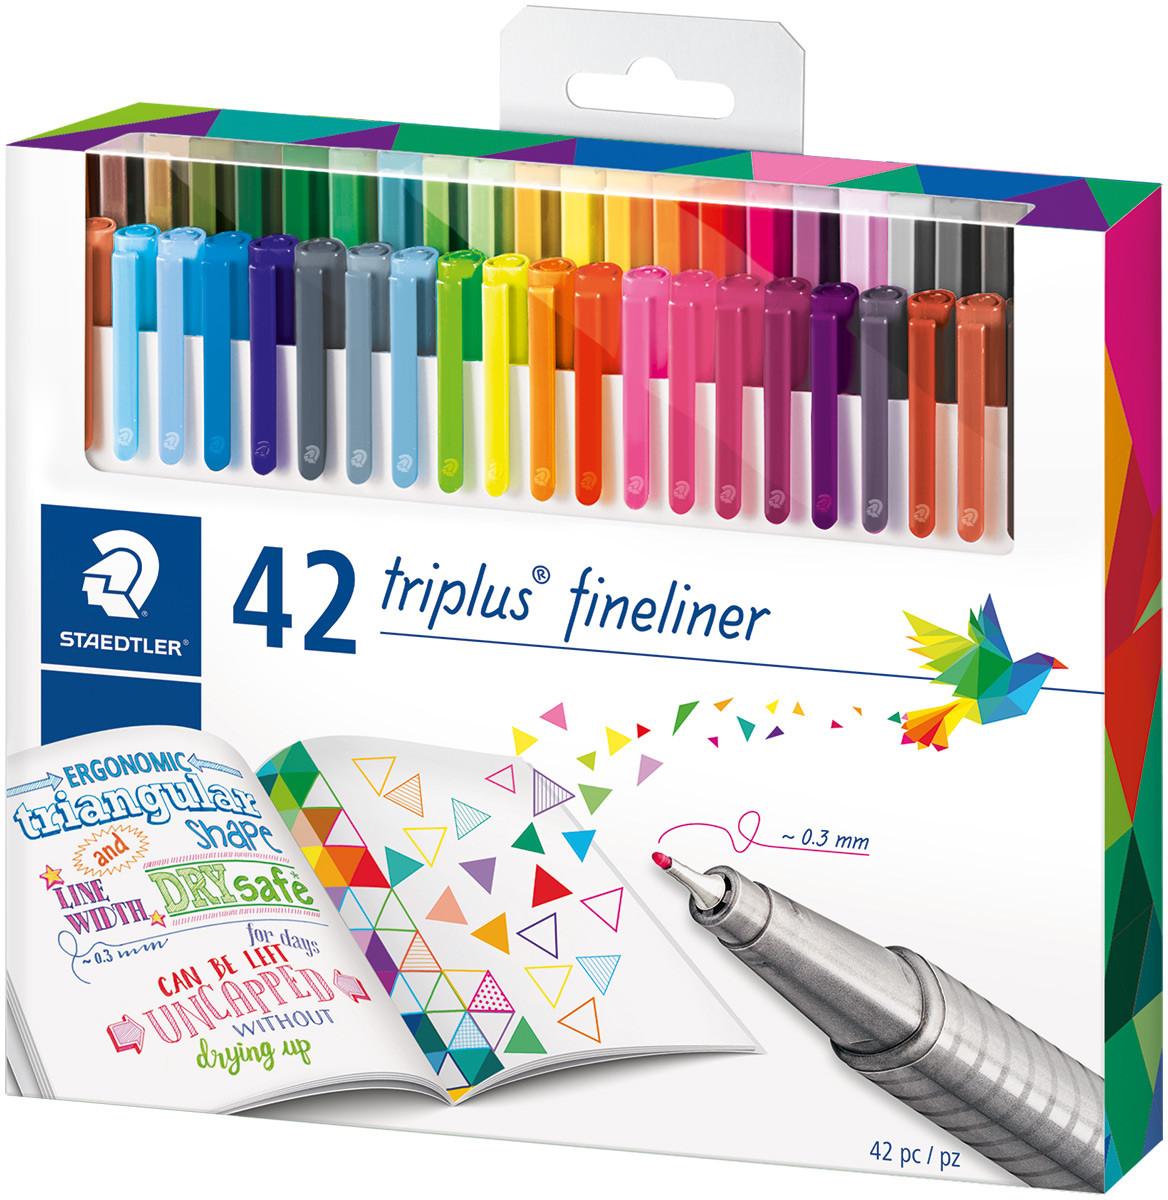 Staedtler Triplus Fineliner Pens - Assorted Colours (Pack of 42)